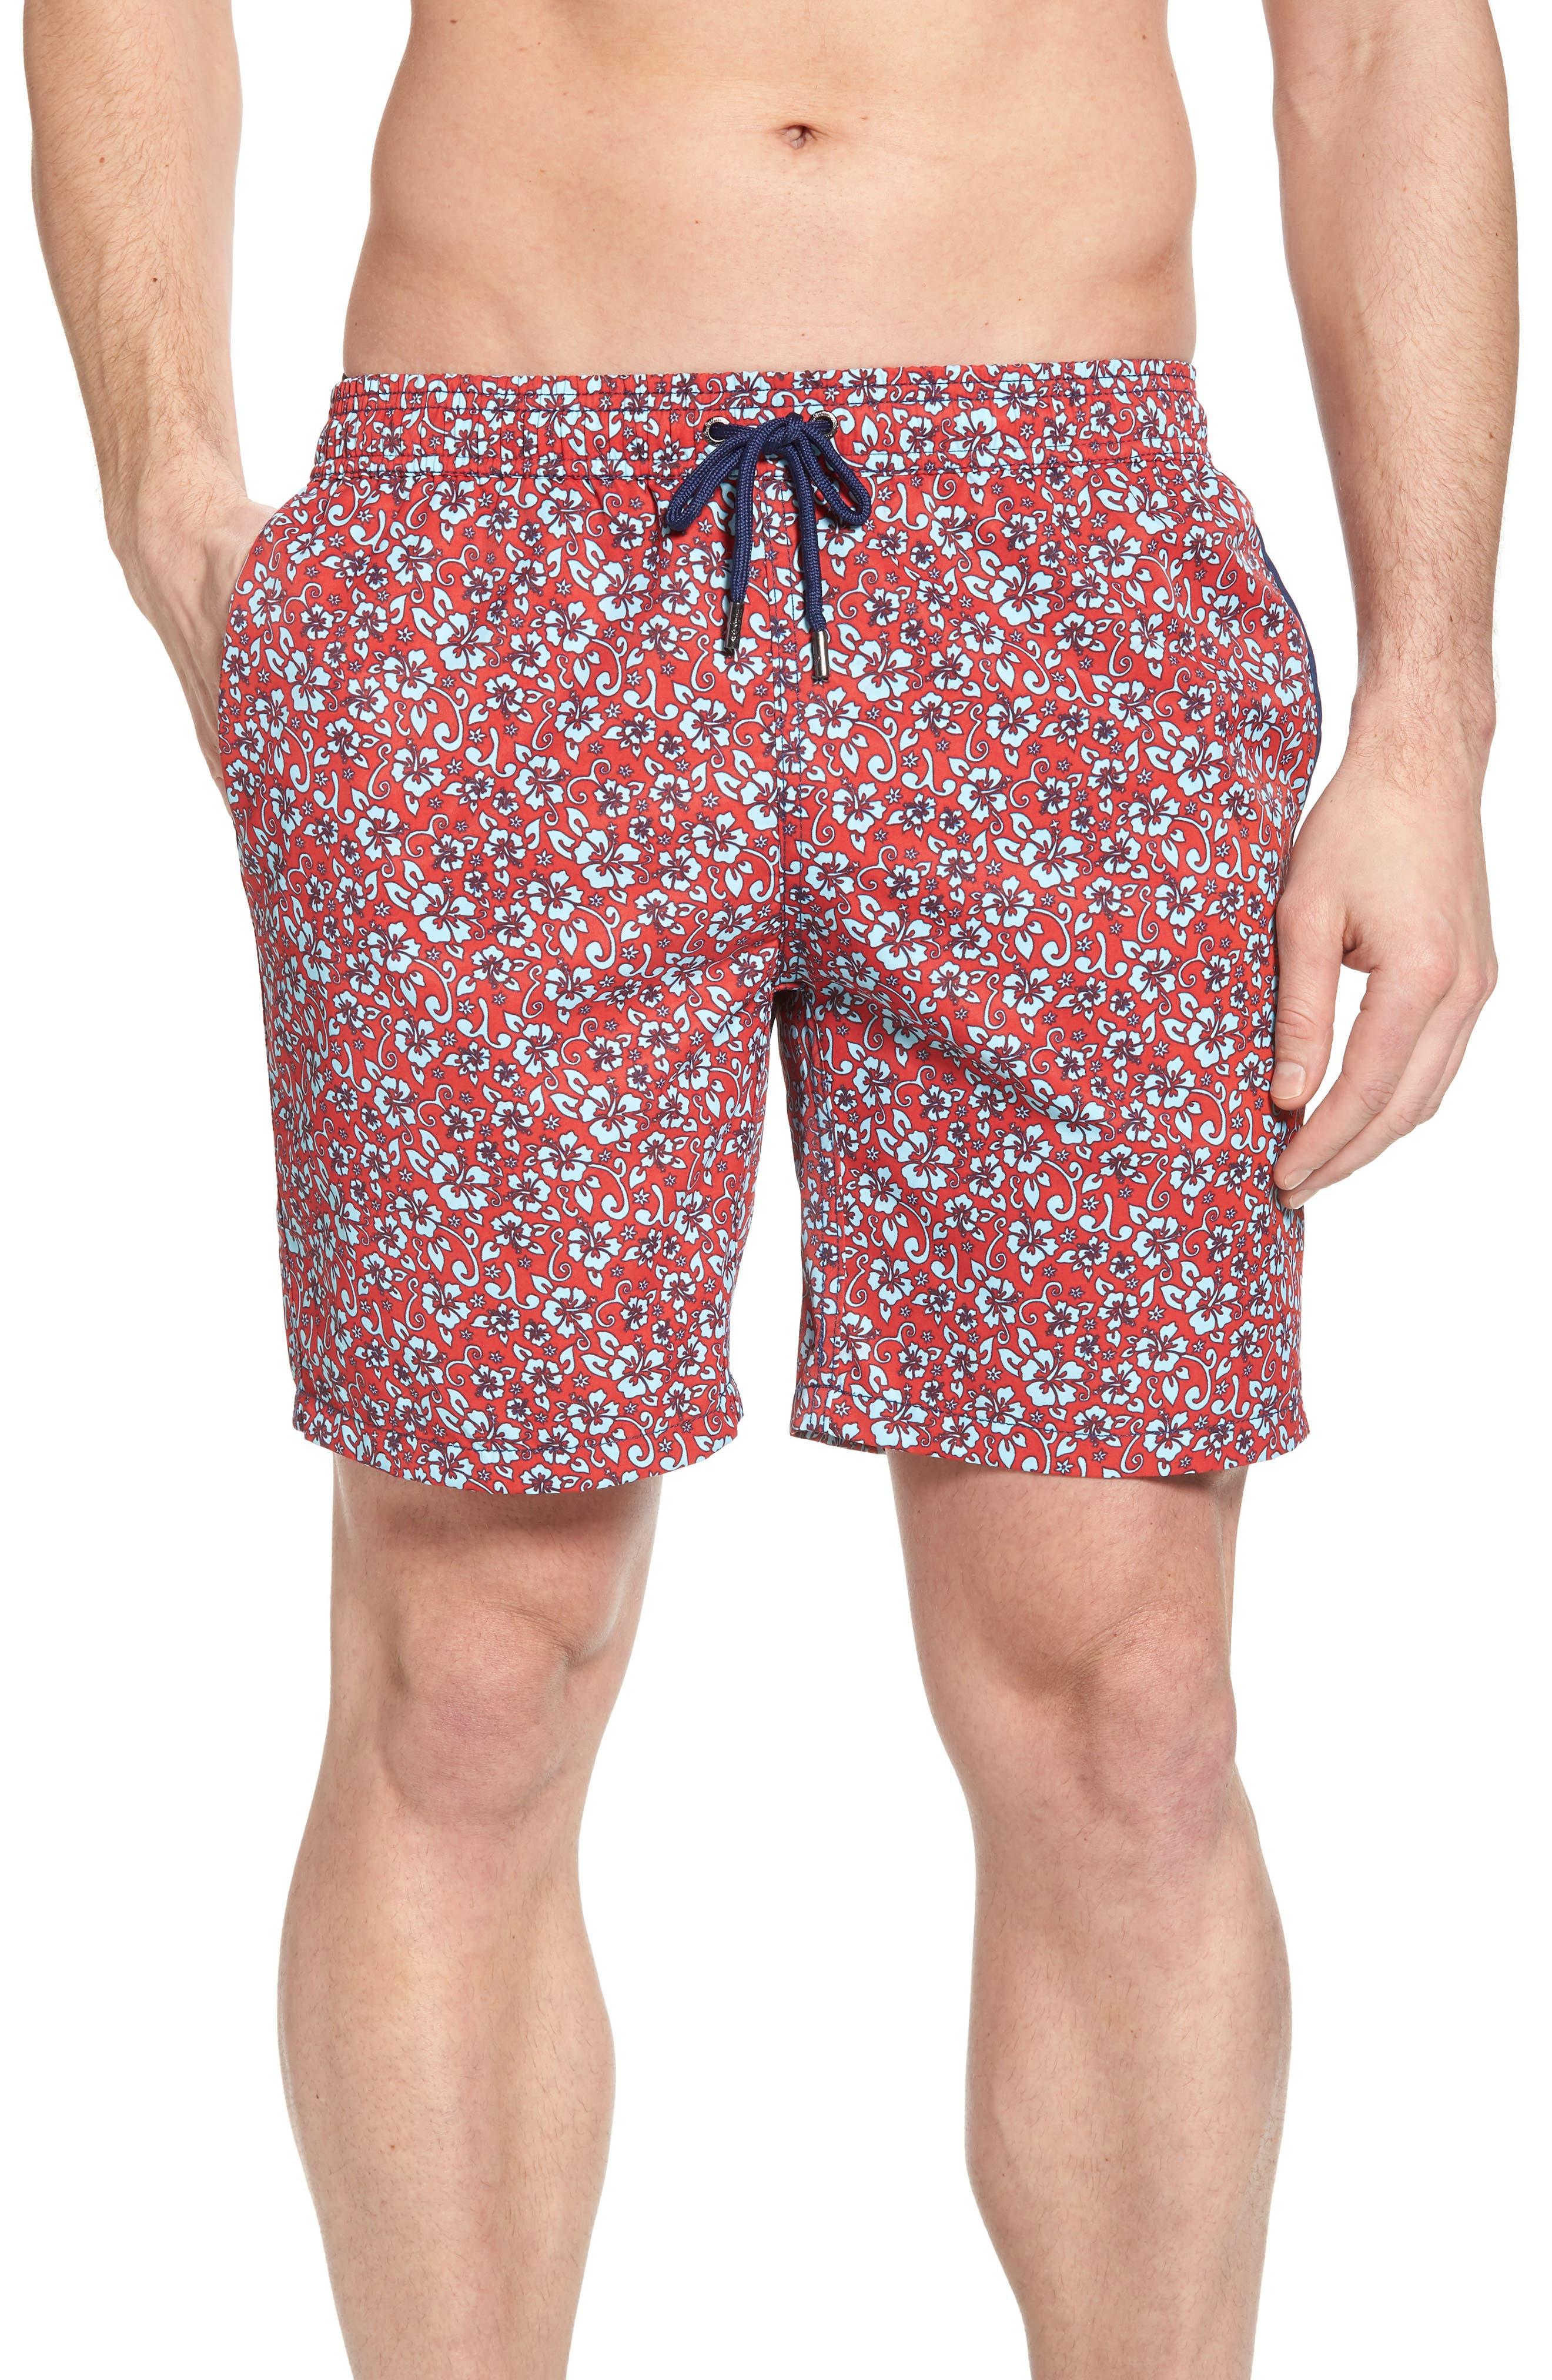 Mr. Swim Trim Fit Floral Swim Trunks,                         Main,                         color, 600